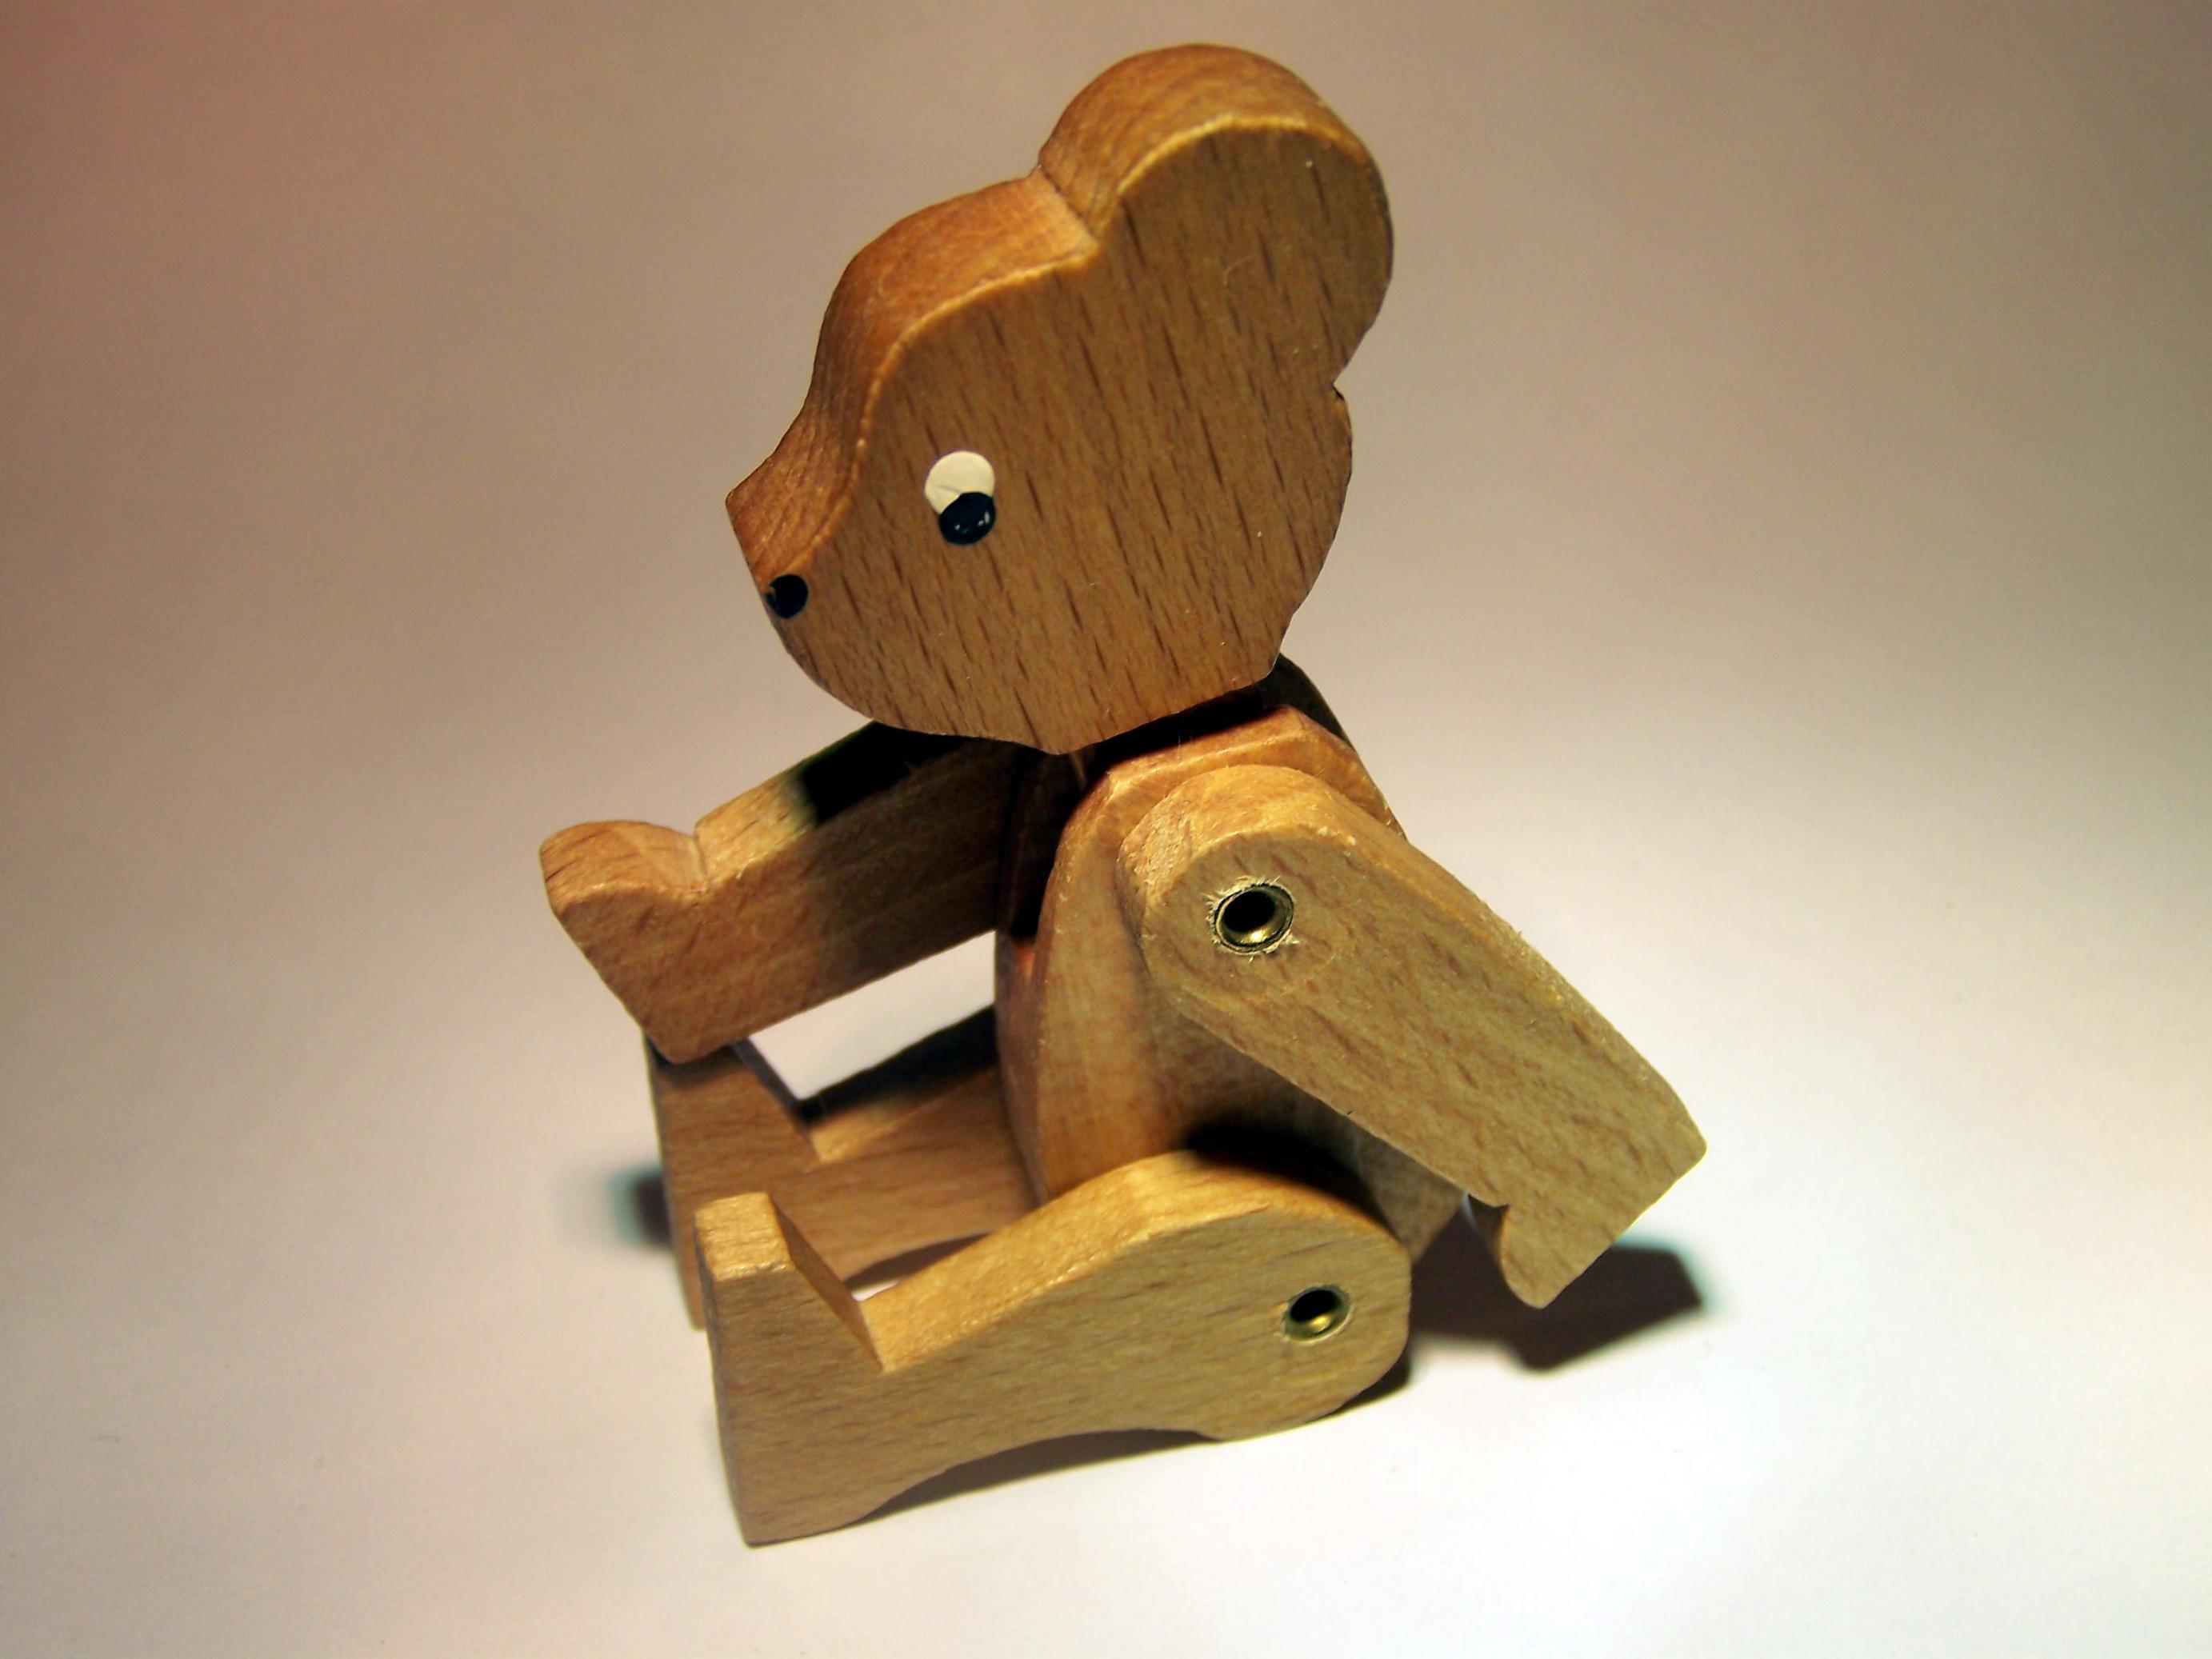 Holzspielzeug: Neuster Trend im Kinderzimmer